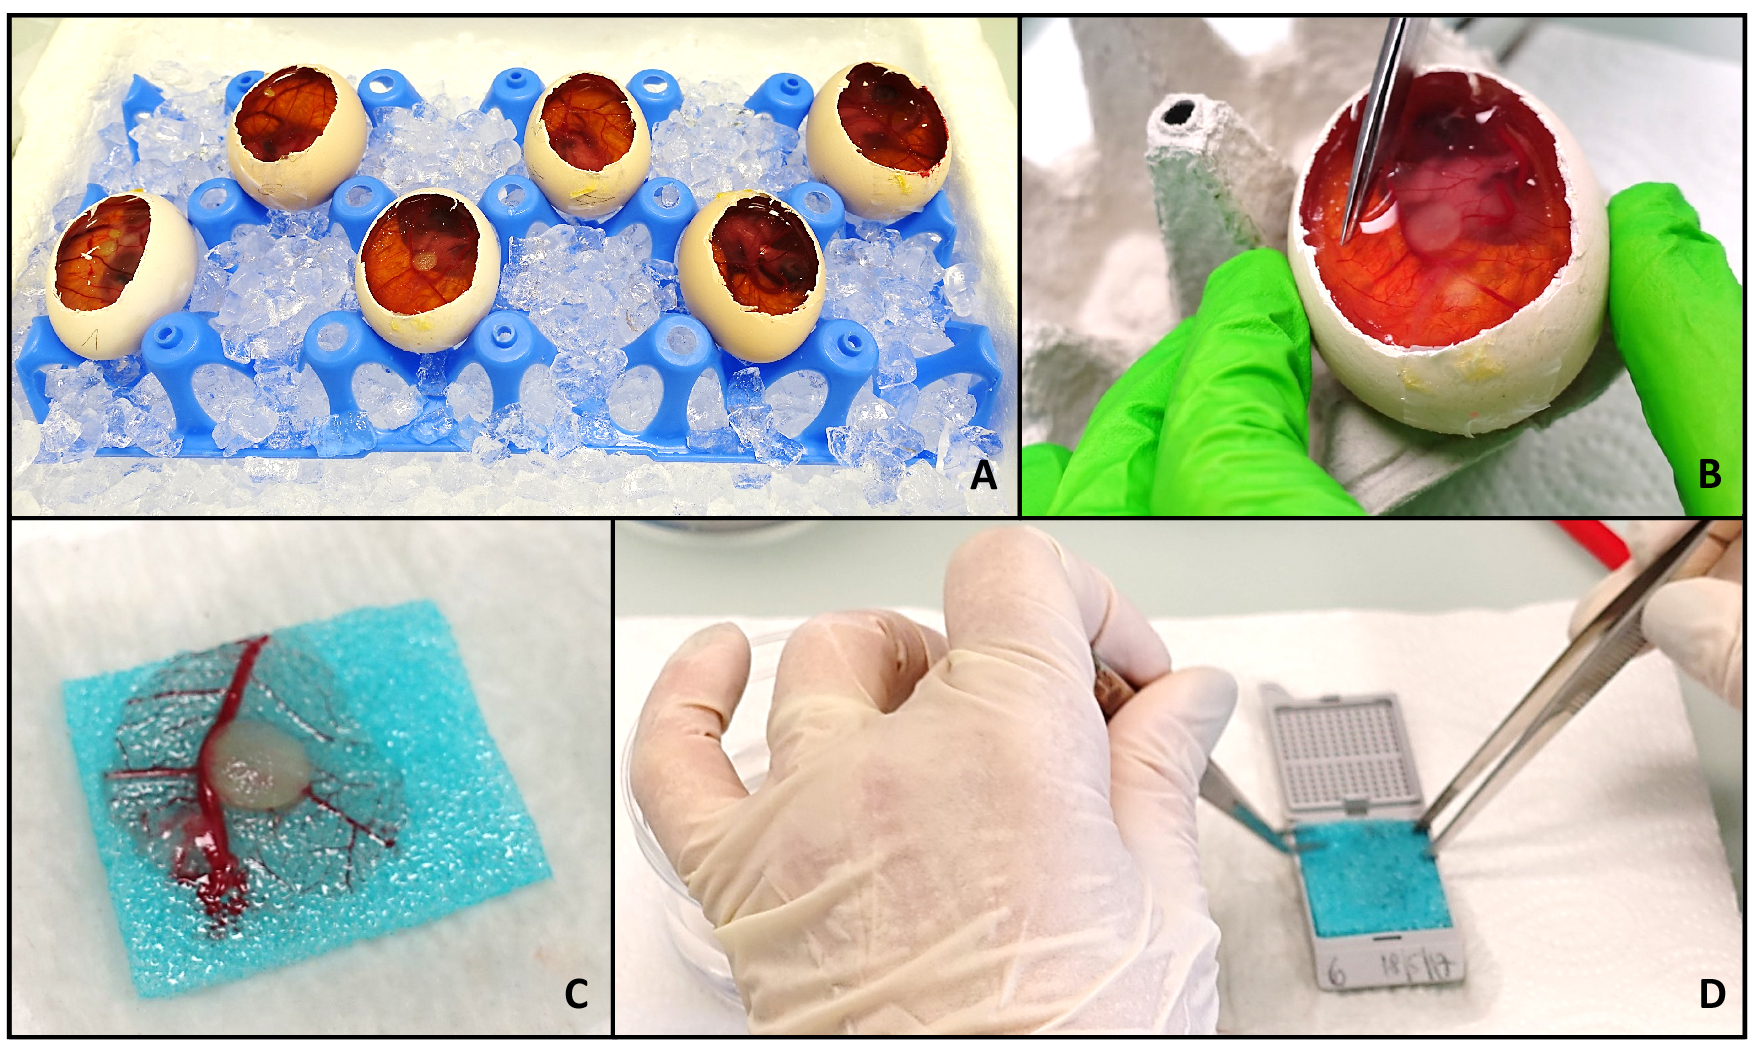 The Chick Chorioallantoic Membrane (CAM) Assay as a